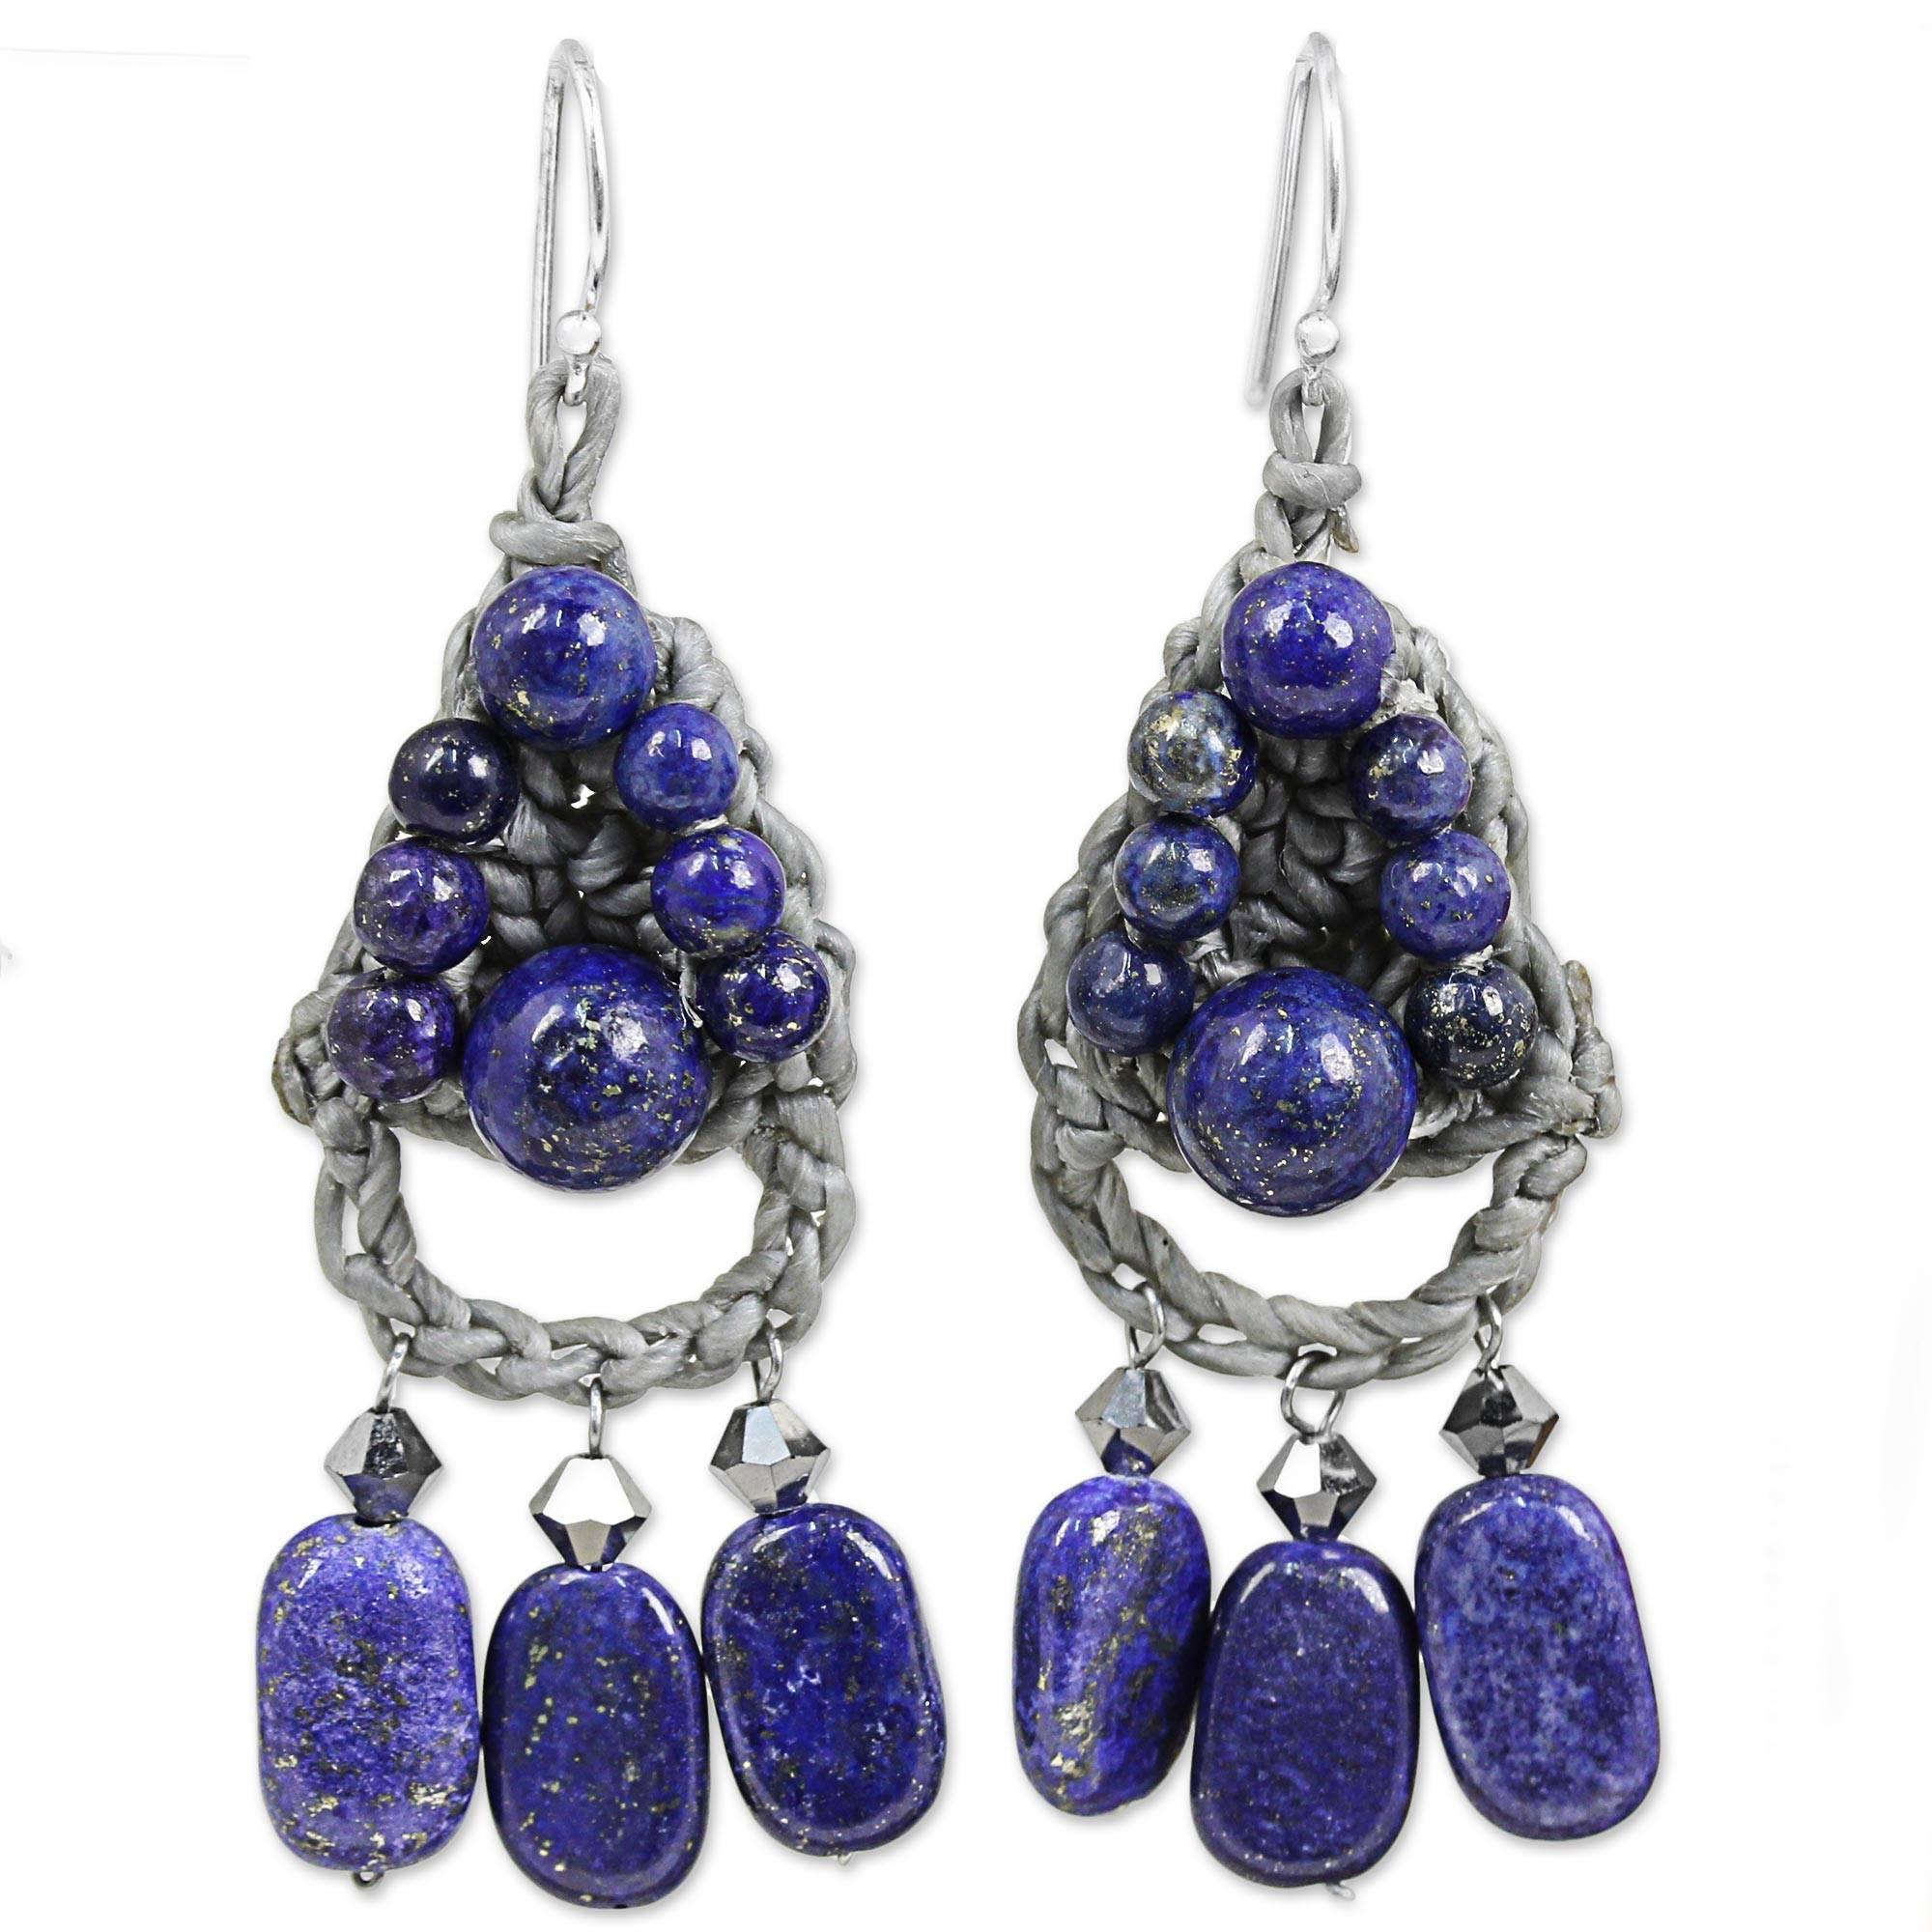 8f6039a030fd9 Handmade Sterling Silver 'Blue Folk Lace' Lapis Lazuli Earrings (Thailand)  - Blue